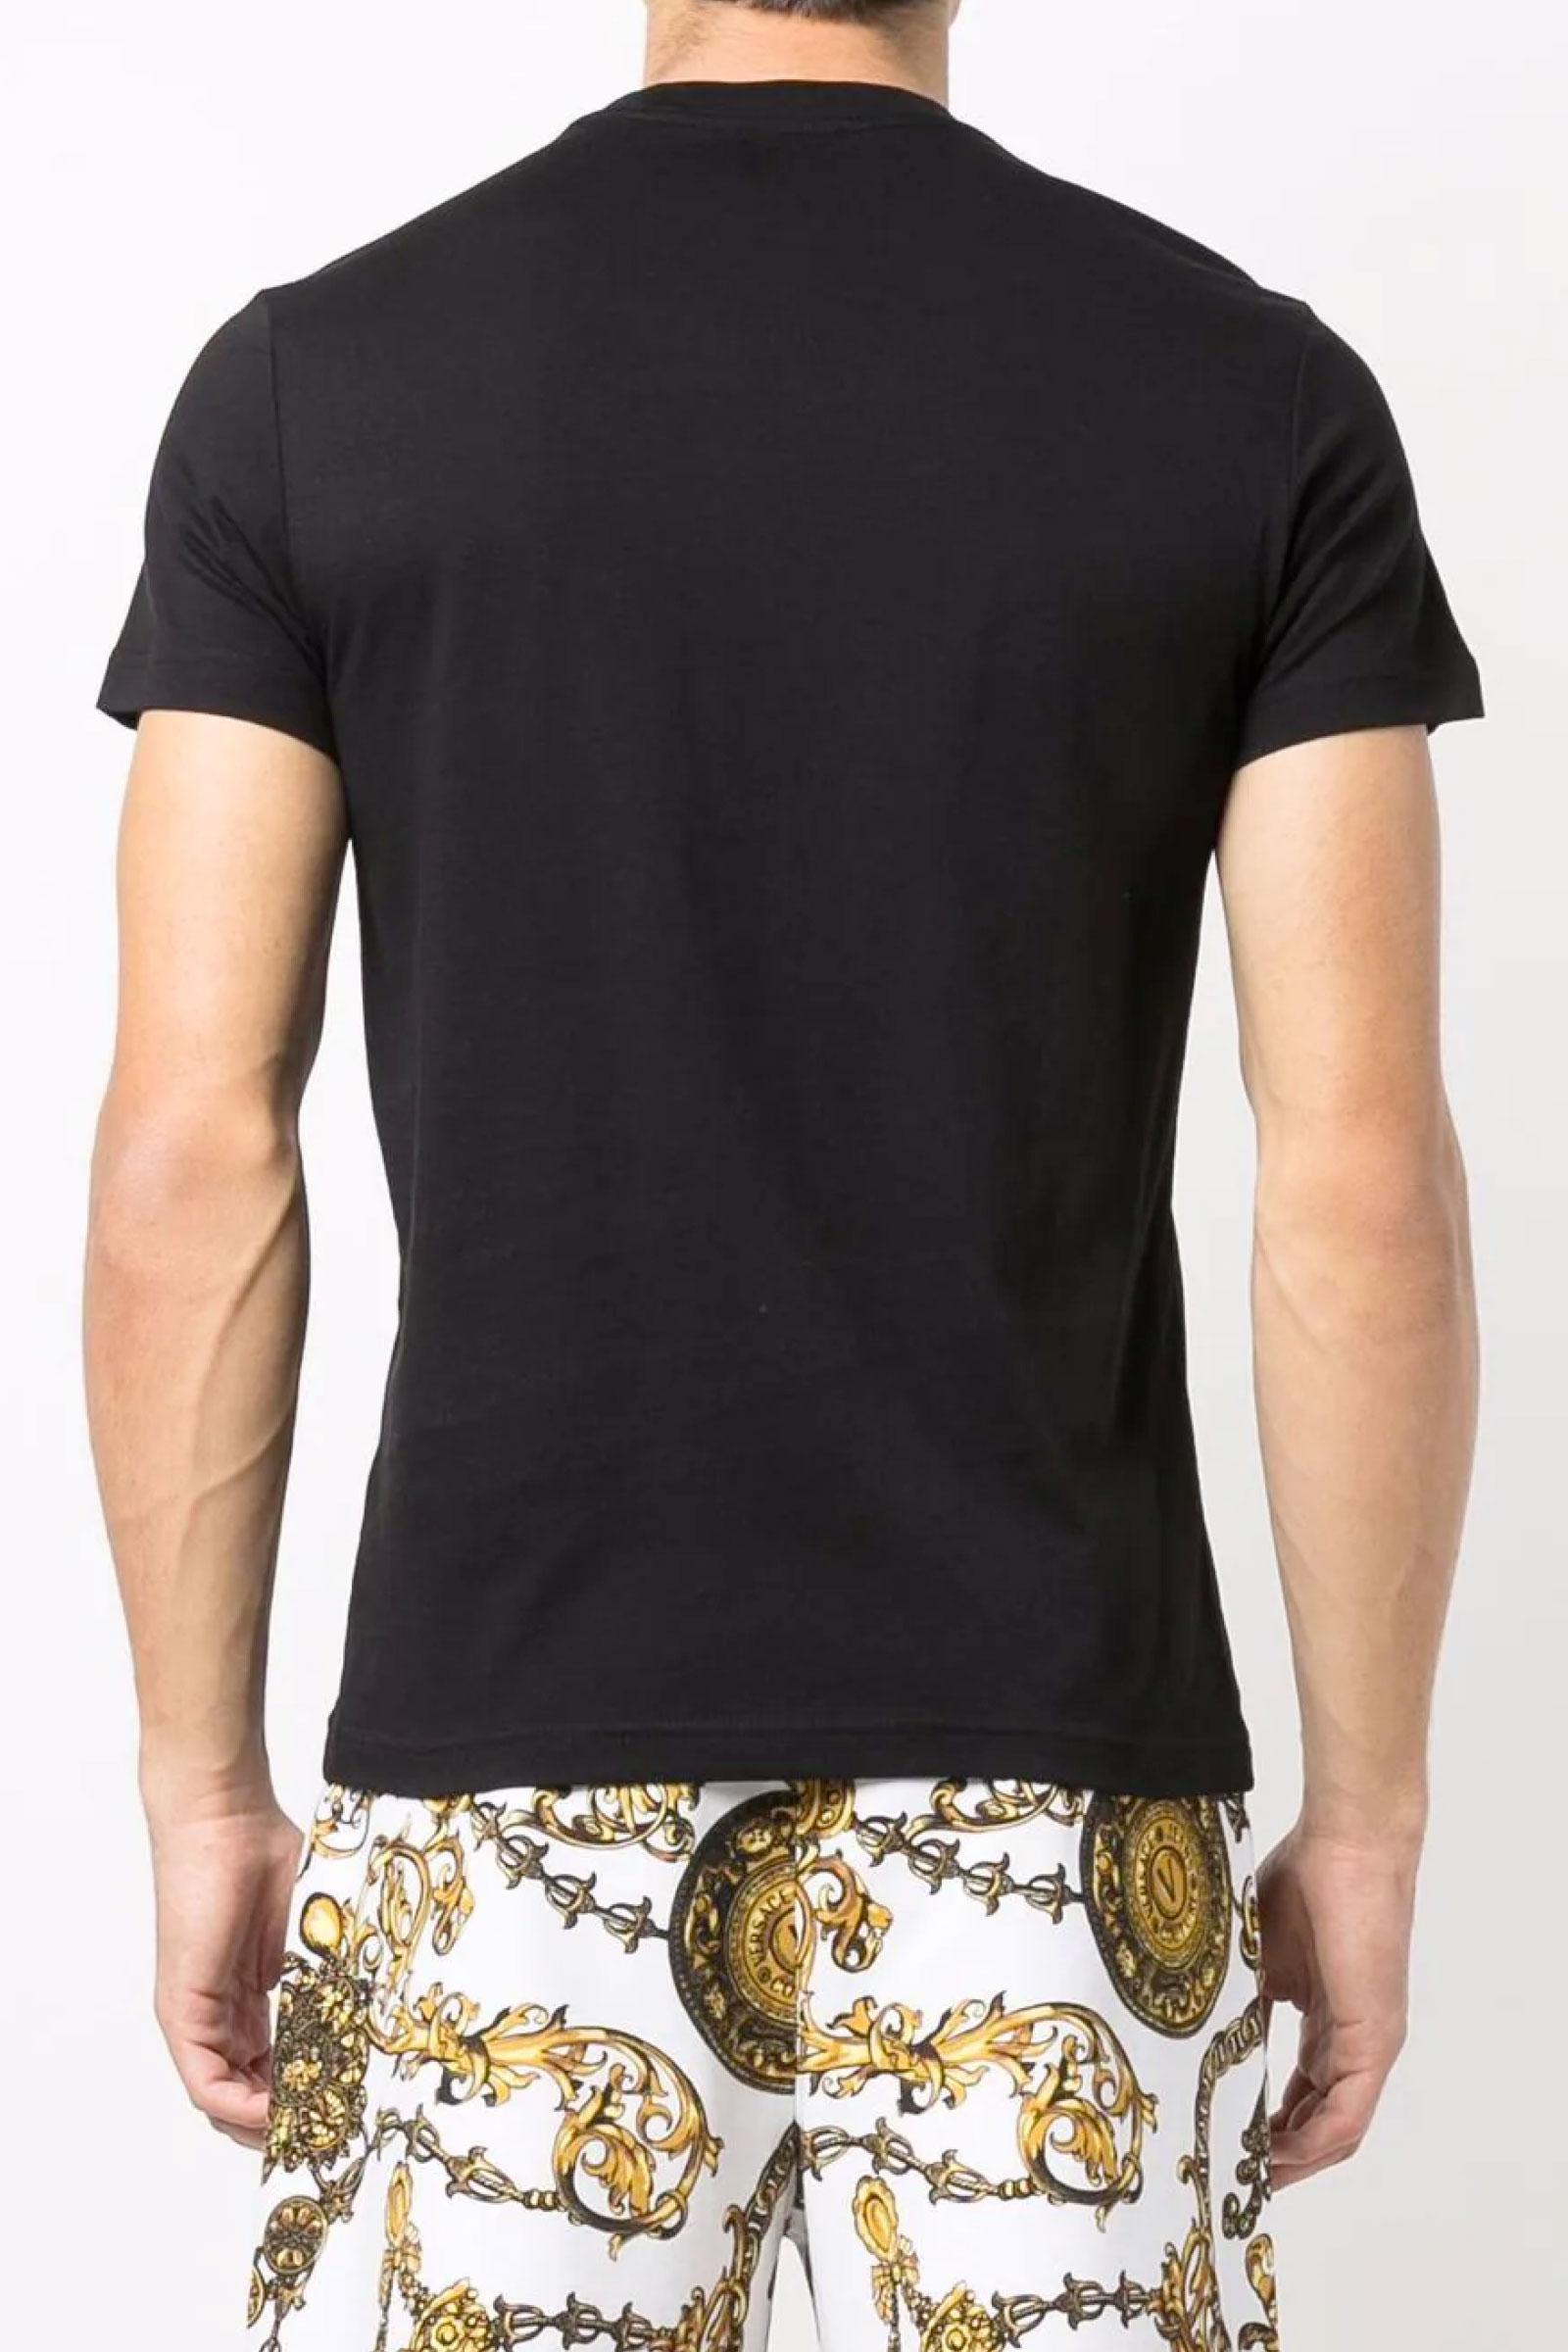 T-Shirt Uomo VERSACE JEANS COUTURE | T-Shirt | 71GAHT27 CJ00TG89